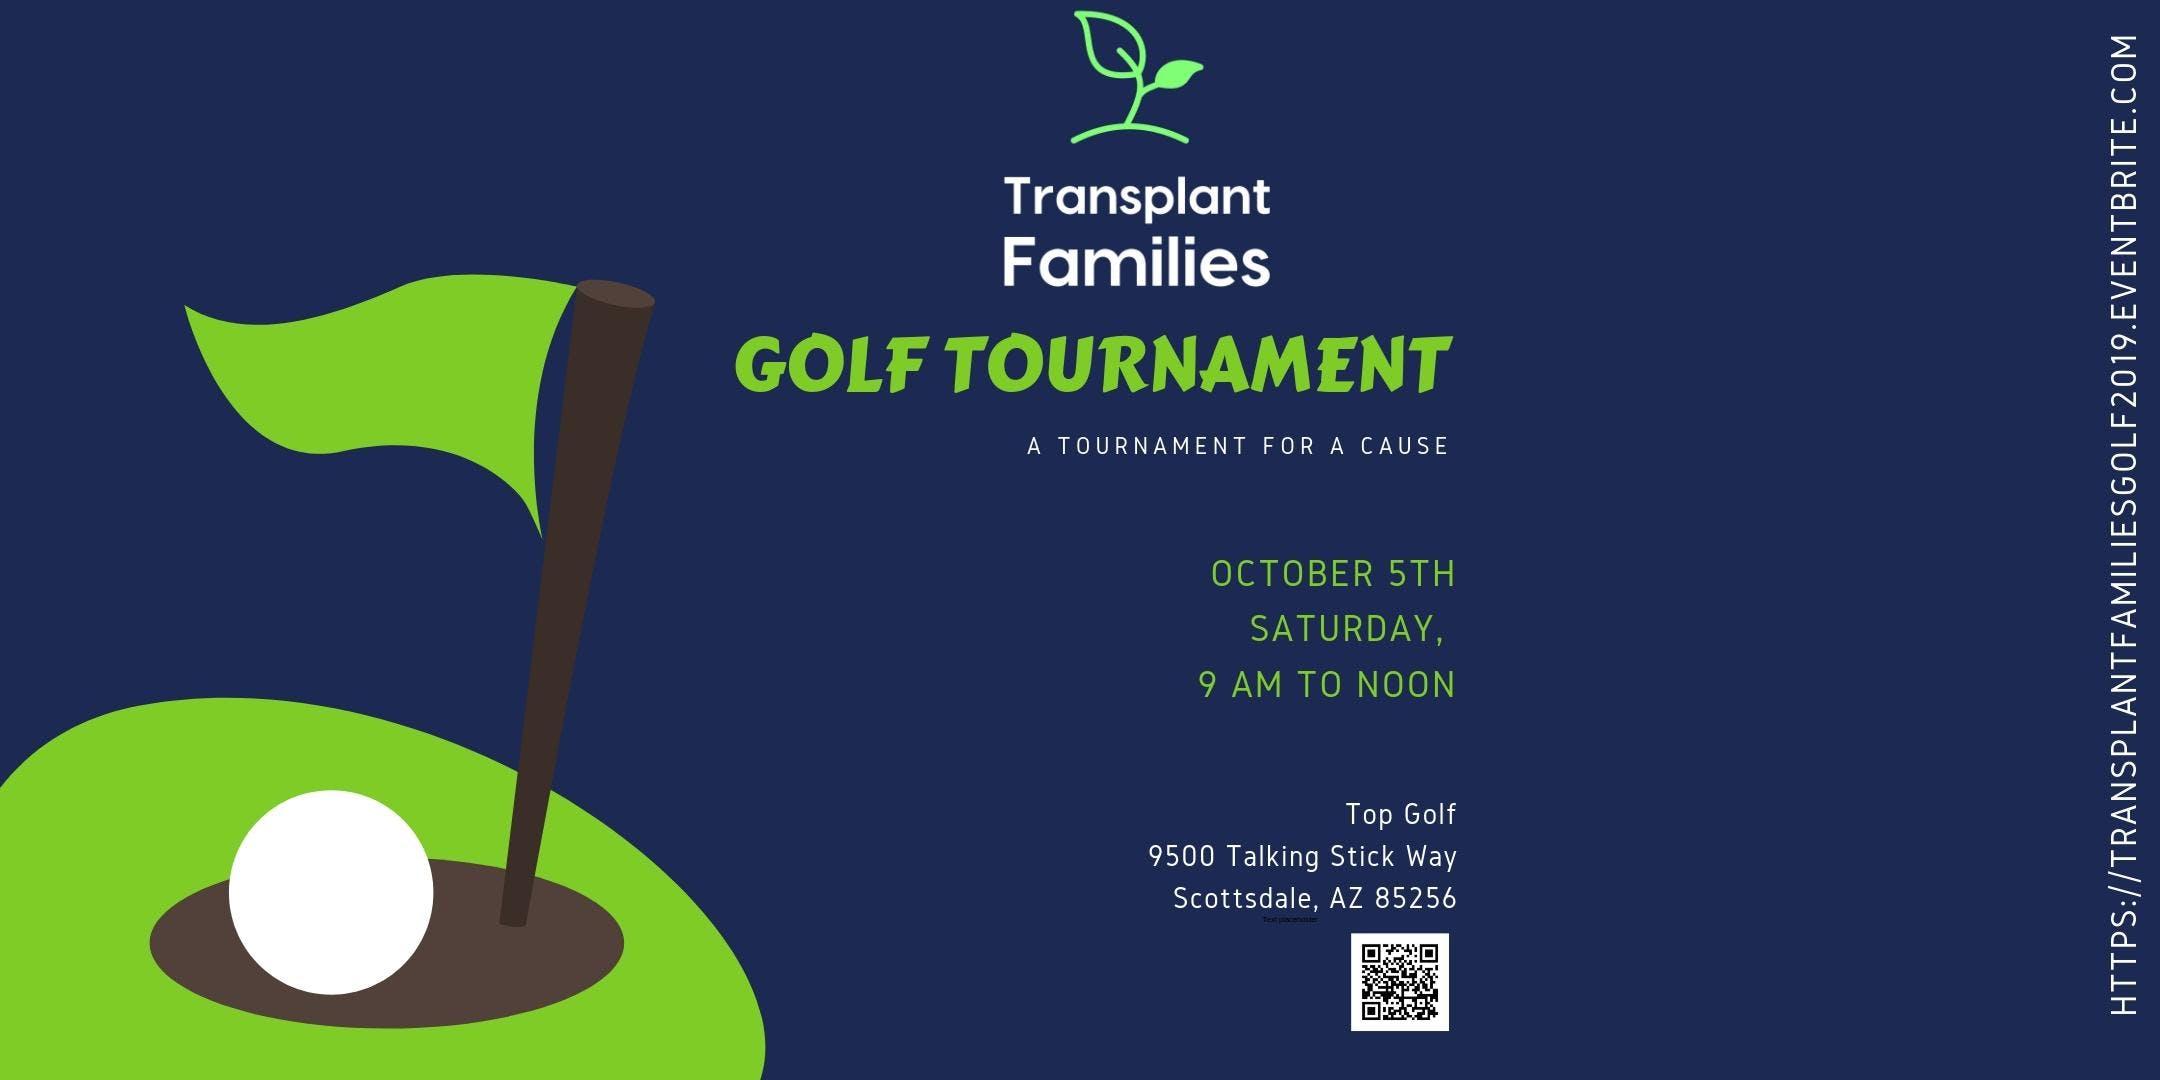 Transplant Families Golf Tournament